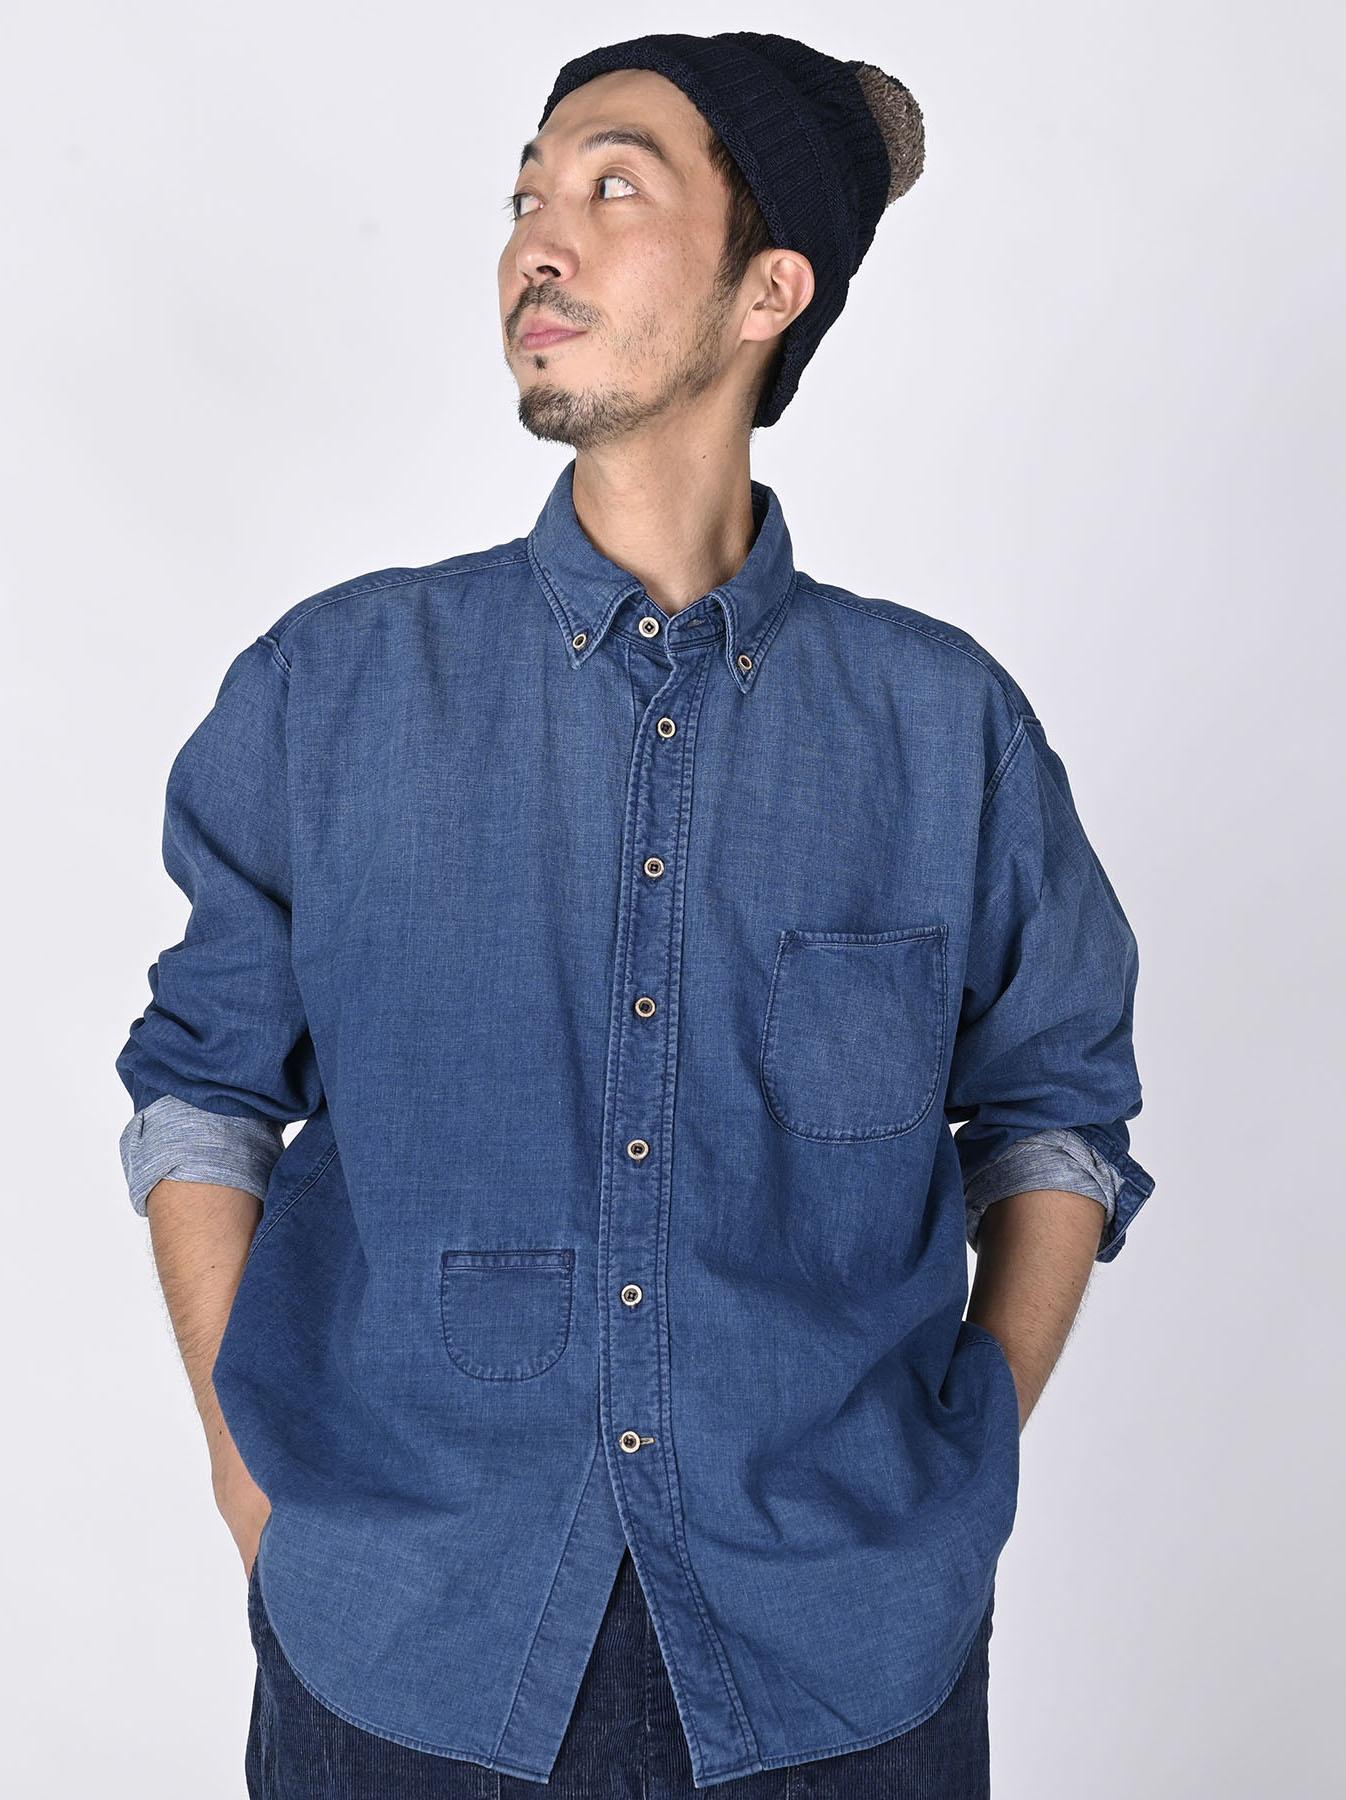 Indigo Gauze 908 Ocean Shirt Distressed-2